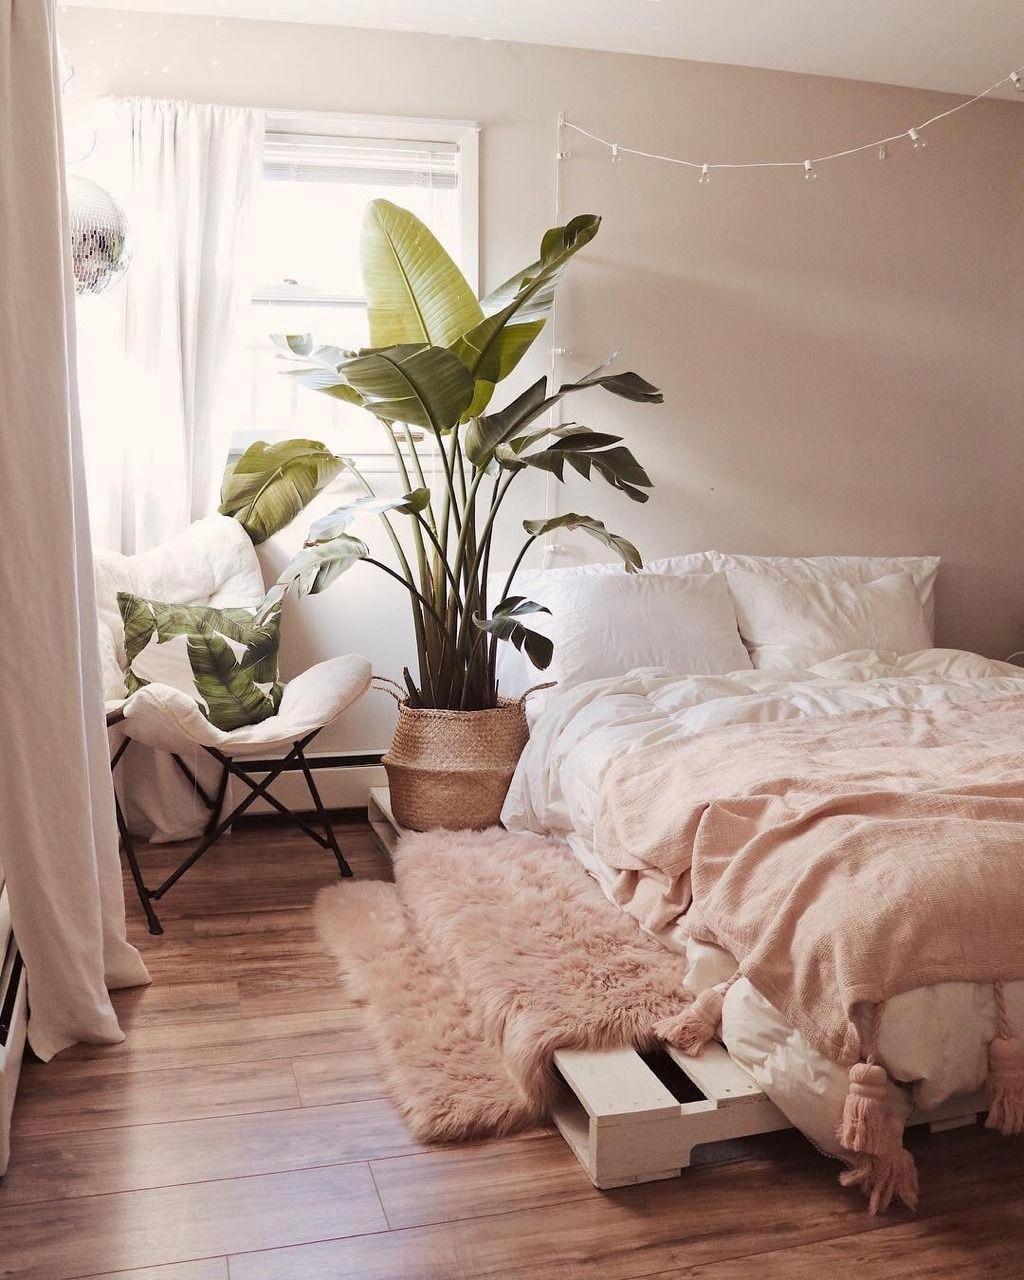 Home Decor Tumblr Diydecorgifts Pink Bedroom Decor Pink Bedrooms Comfy Bedroom